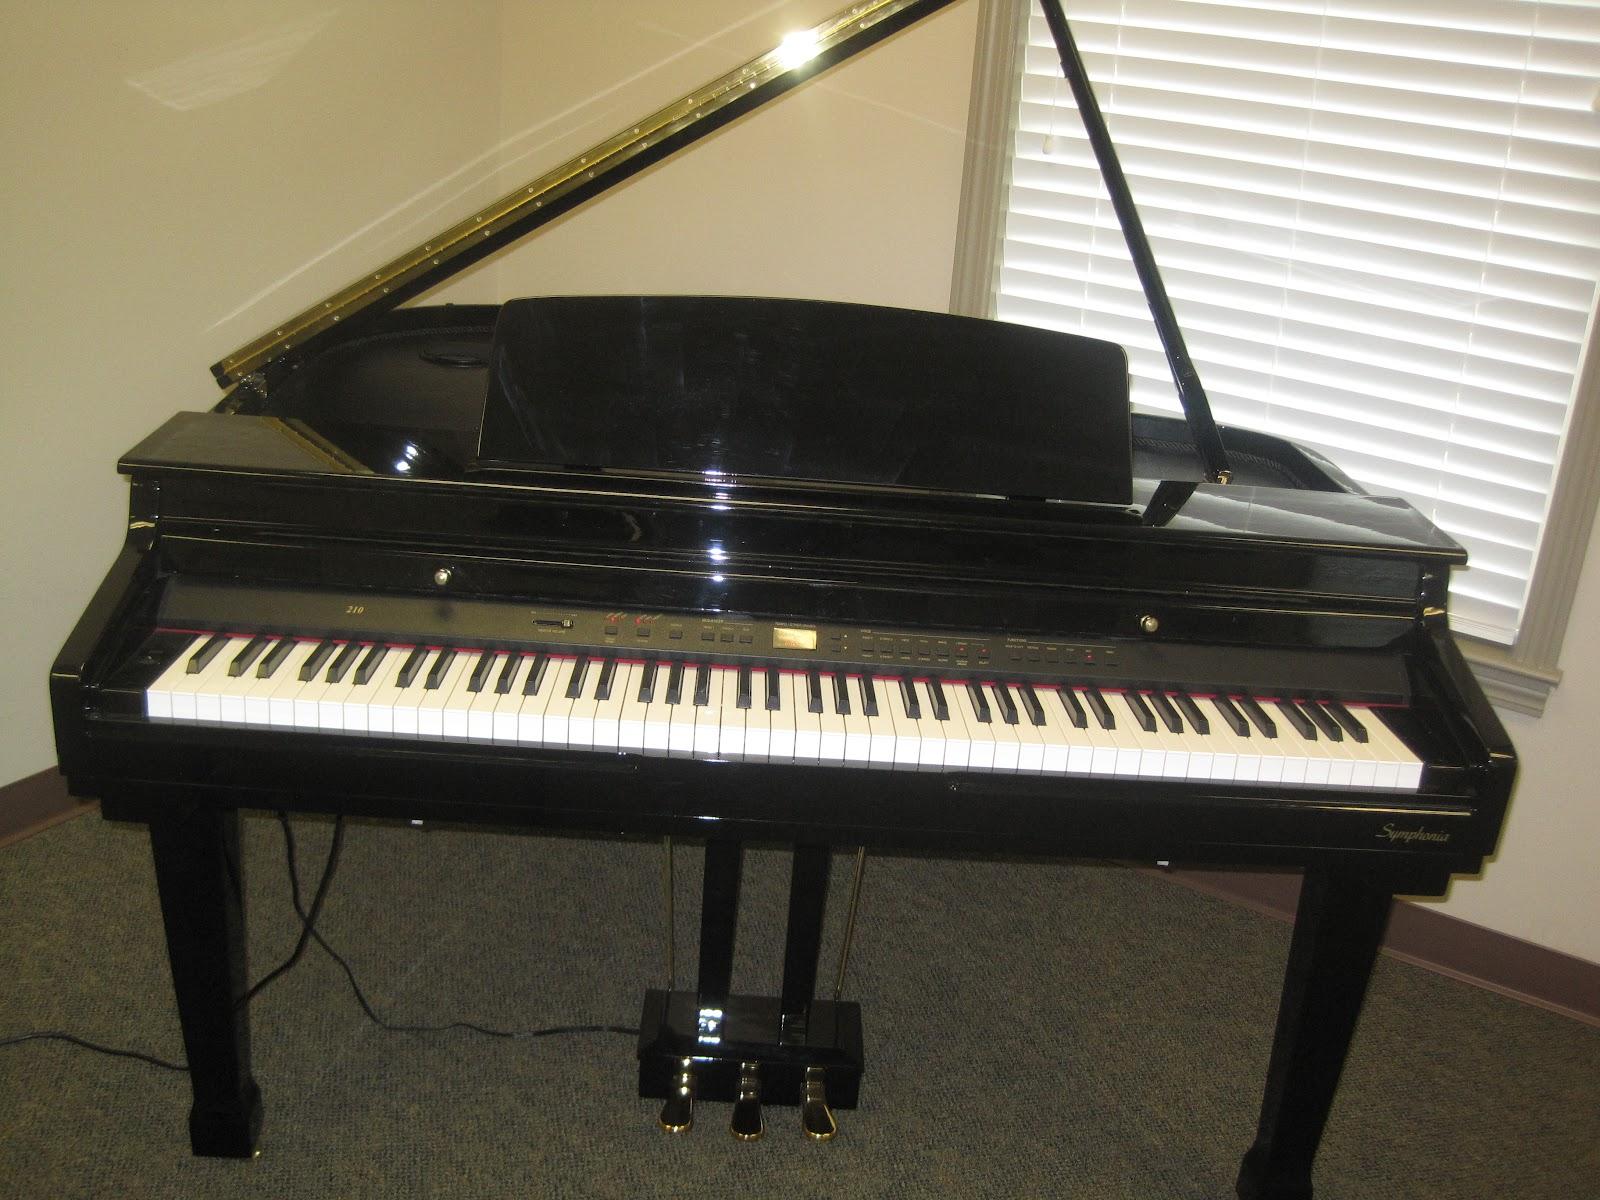 Az piano reviews review samick sg210 digital grand for Dimensions of baby grand piano